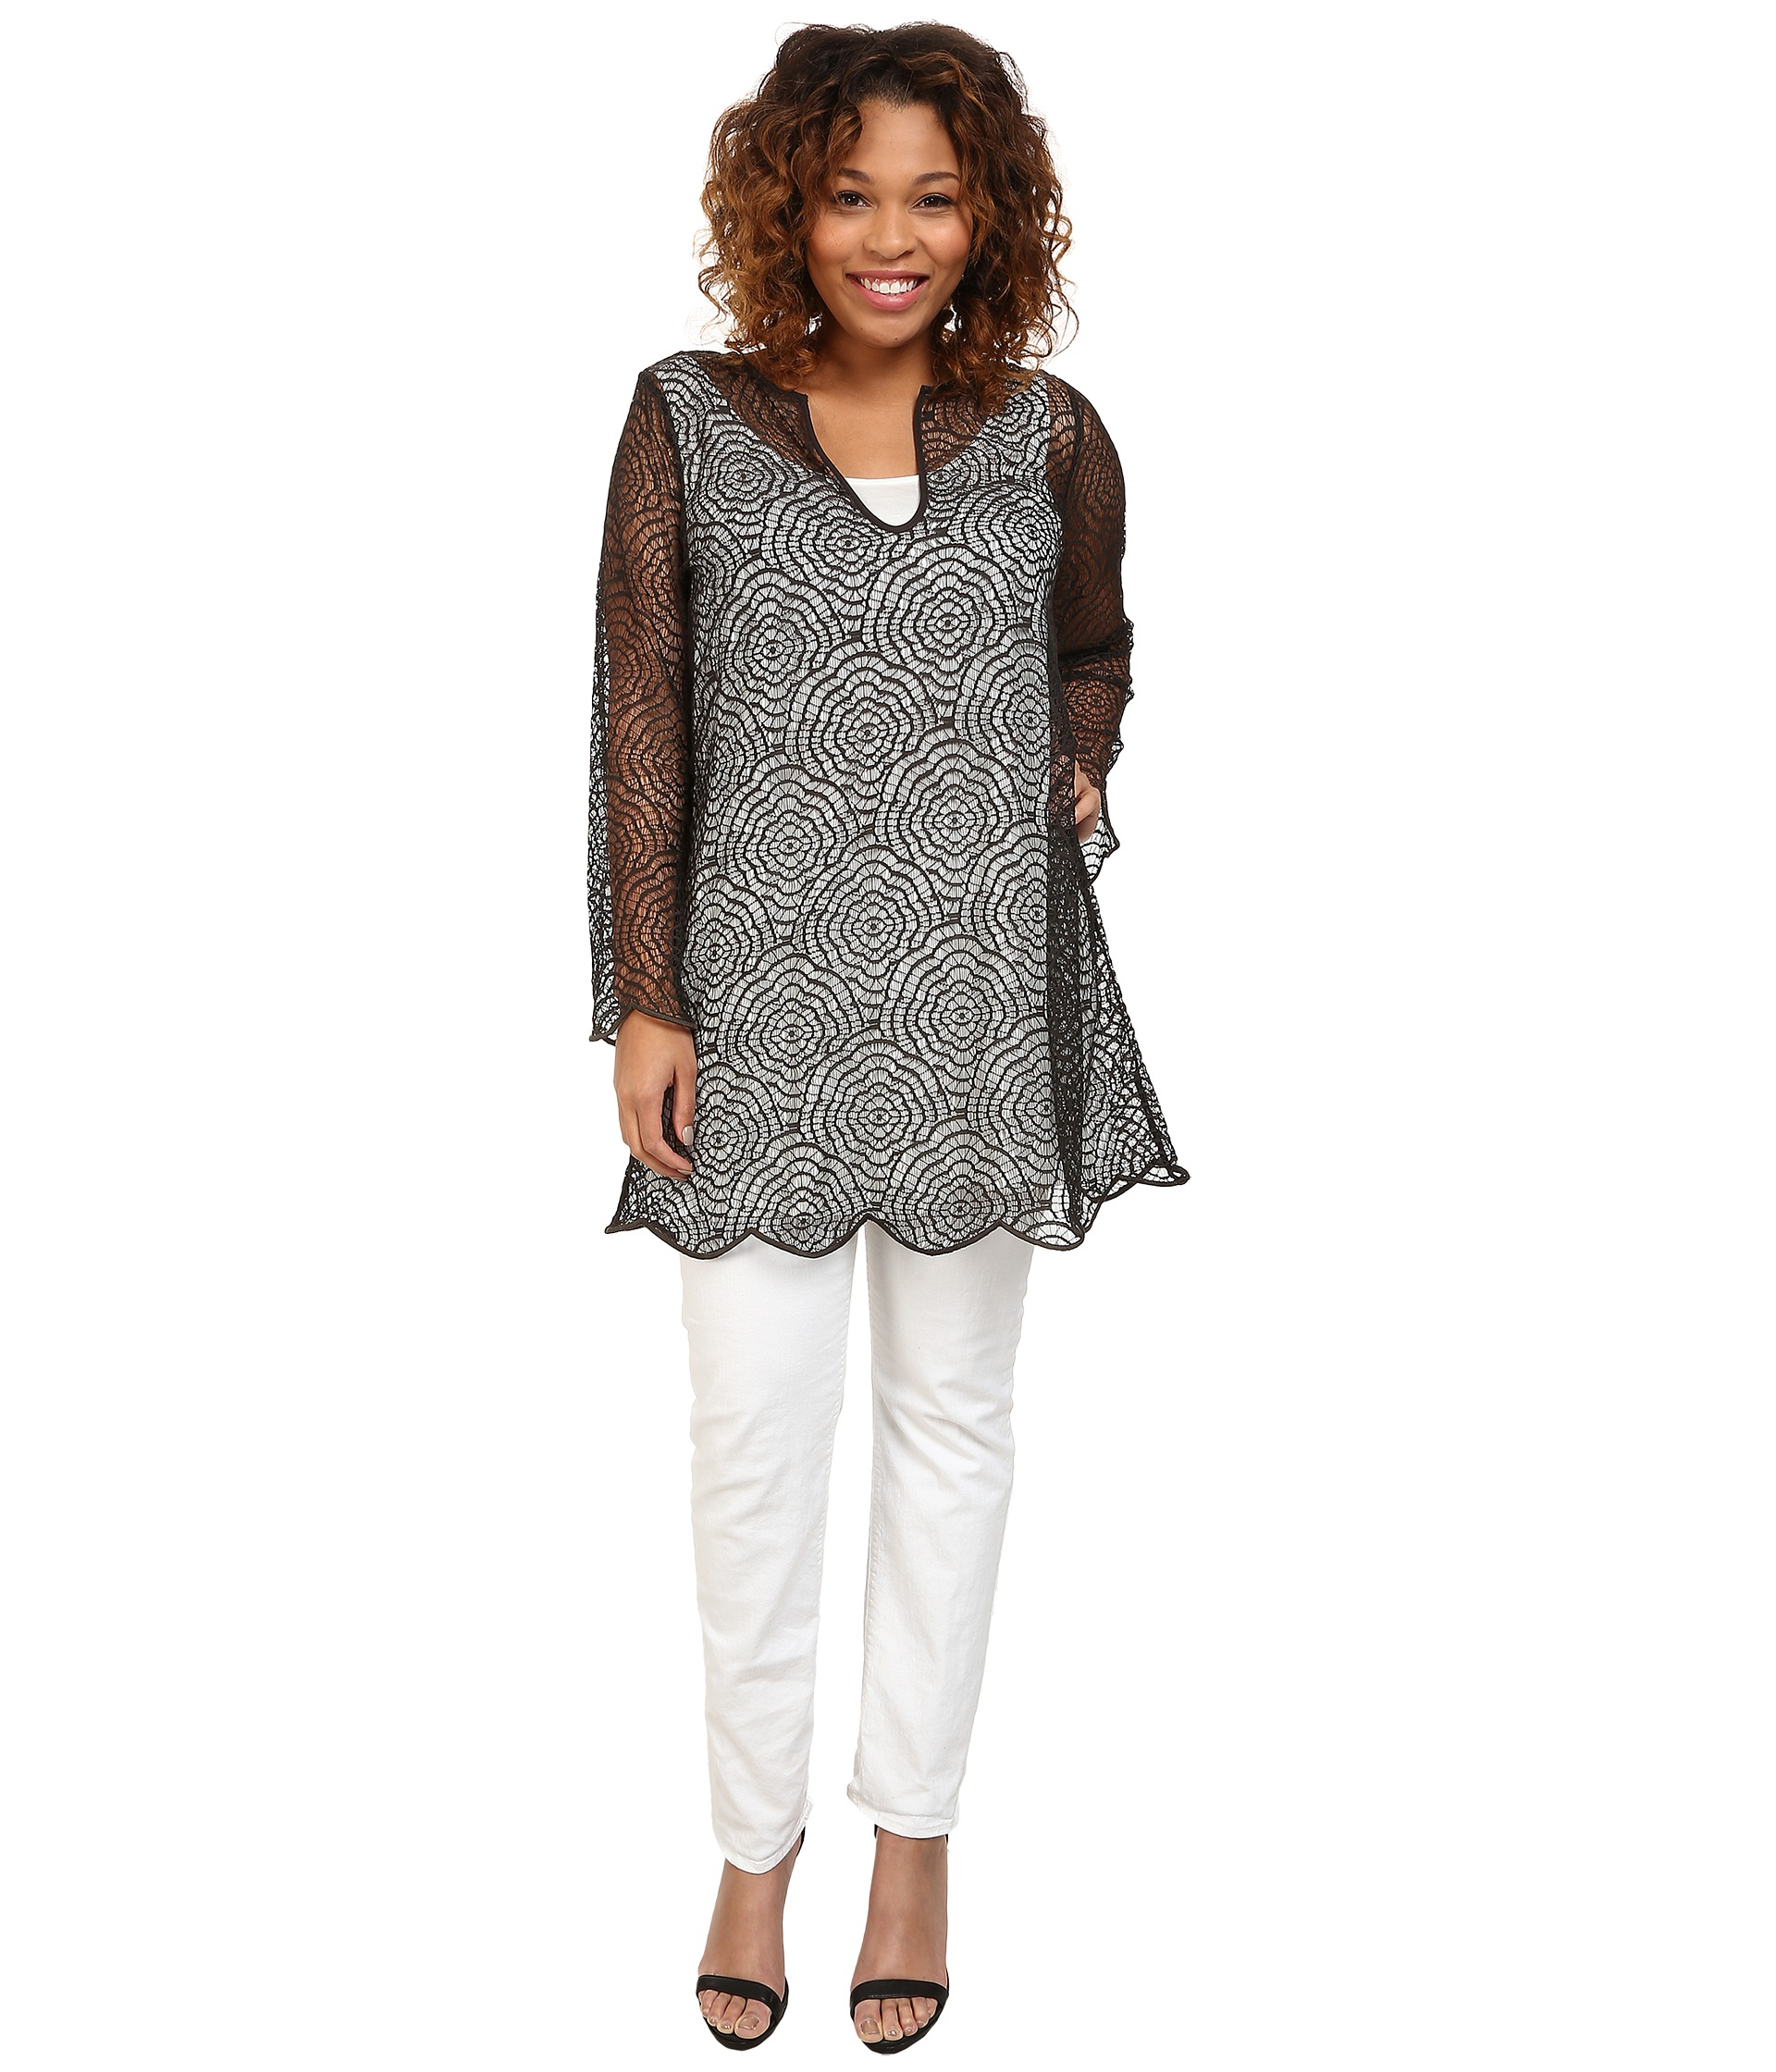 5c0300a50cc Lyst - Nic+Zoe Plus Size Camellia Lace Tunic in Black